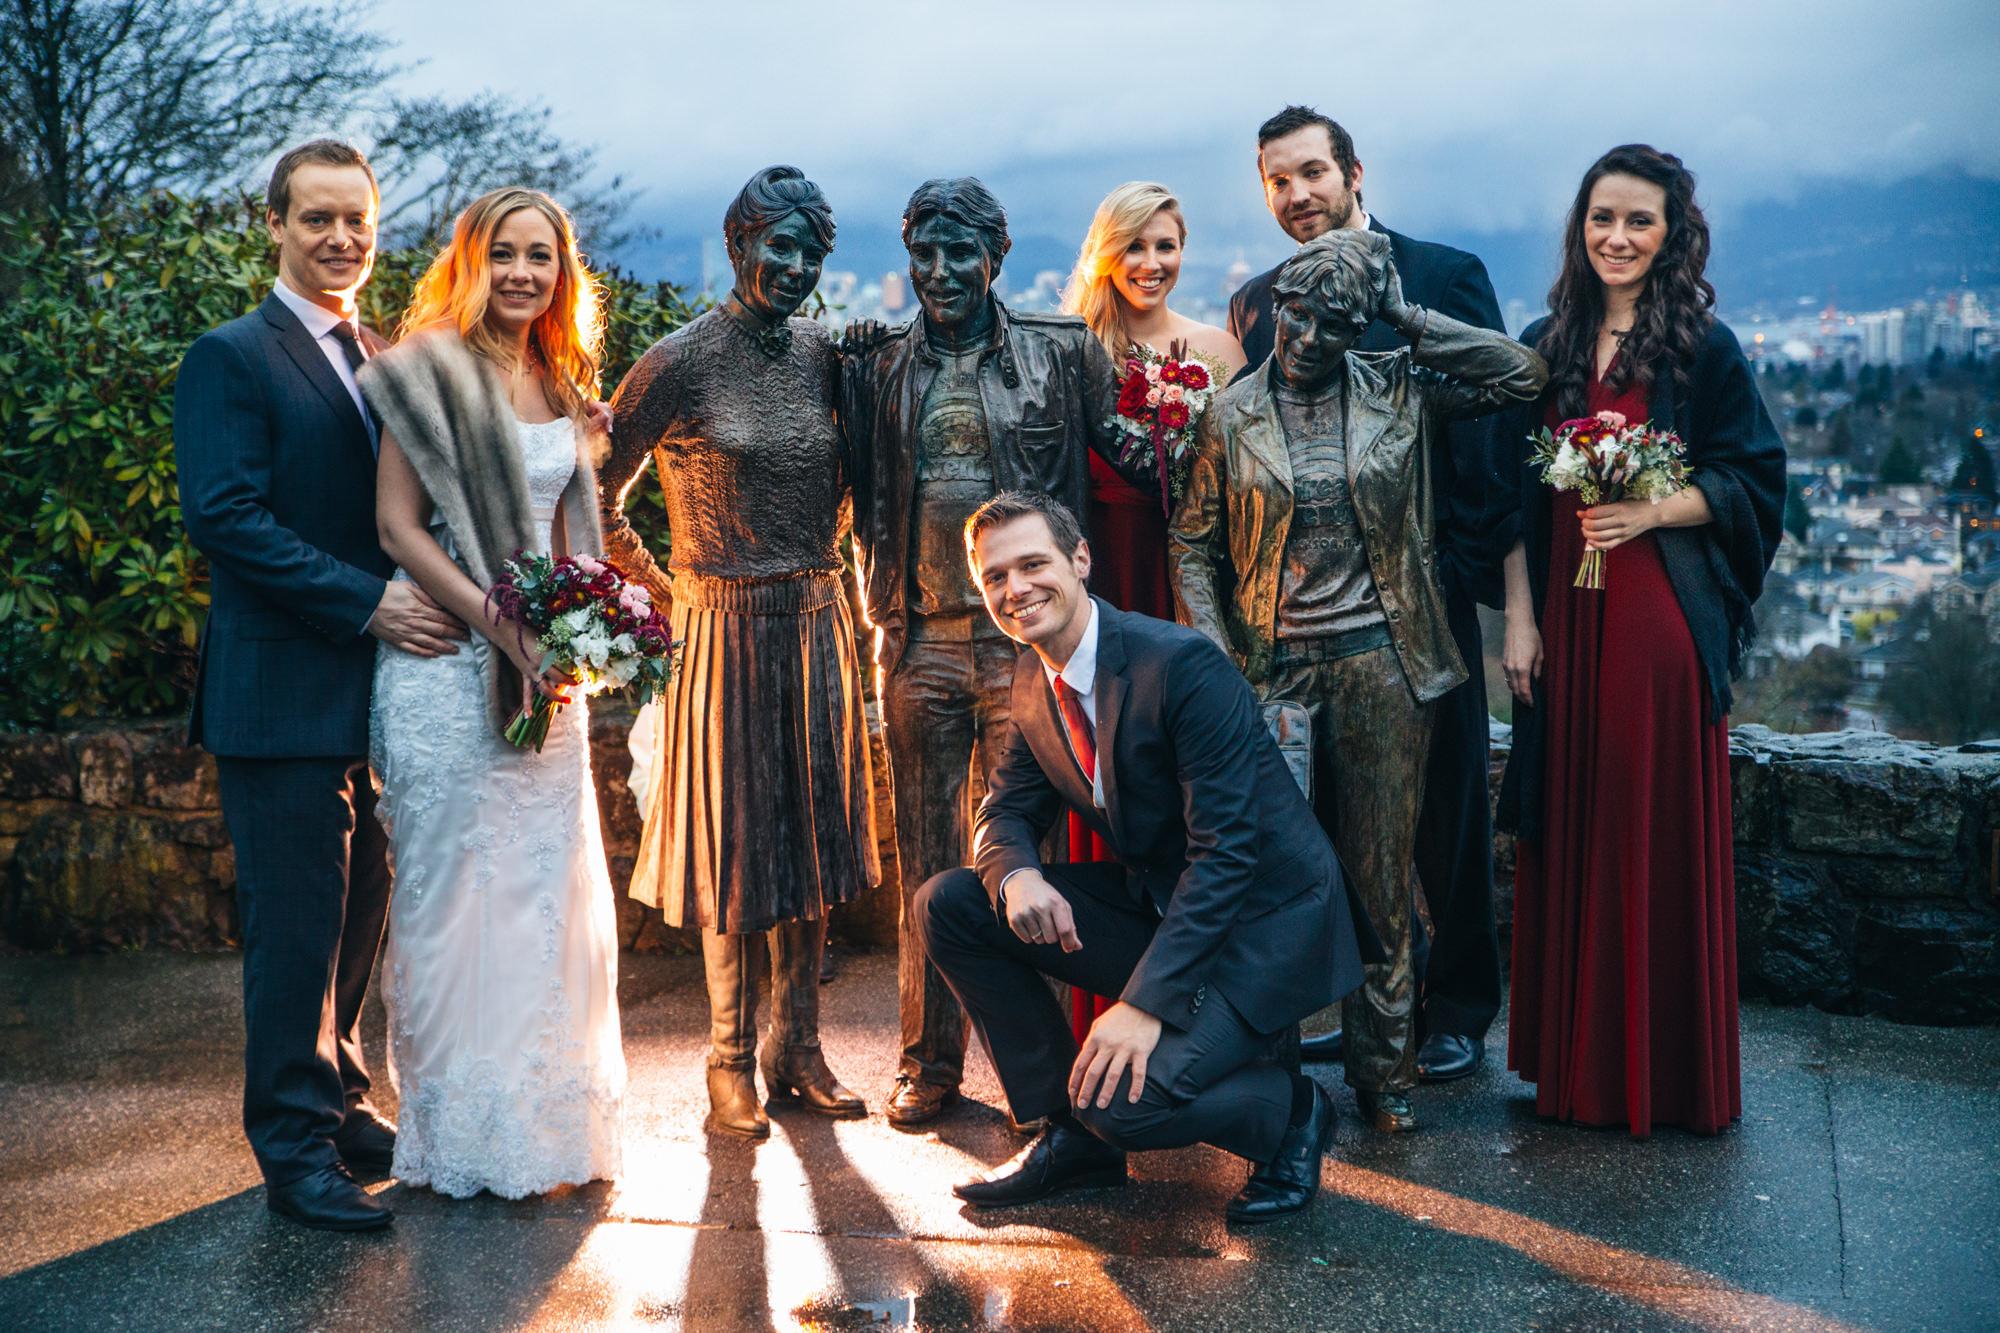 20-queen-elizabeth-park-qepark-wedding-party-statue.jpg